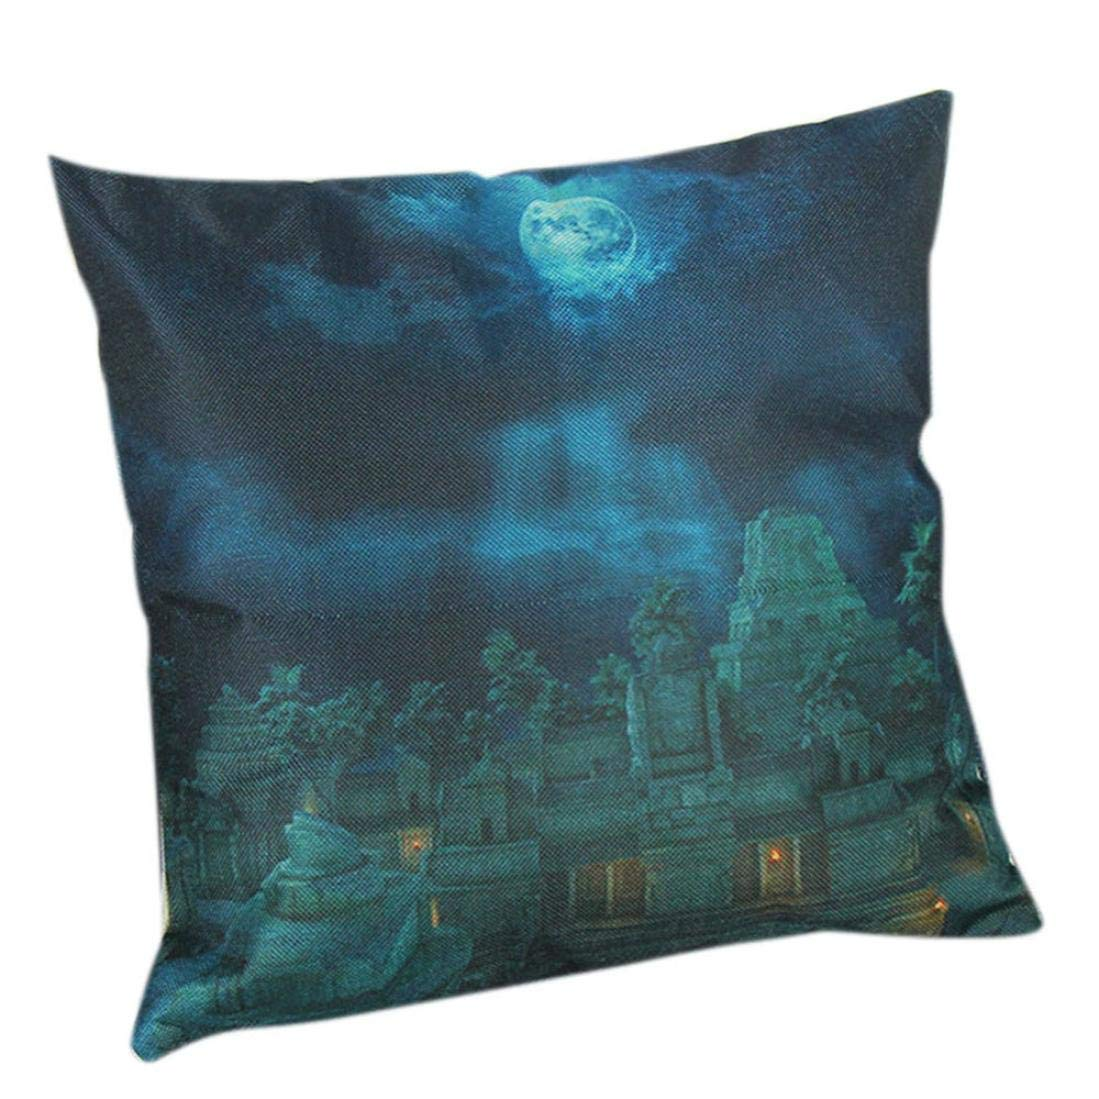 Zainafacai Home Decor Happy Halloween Pillow Cases Pumpkin Castle Print Linen Sofa Cushion Cover 1818 inch (A, One Size)